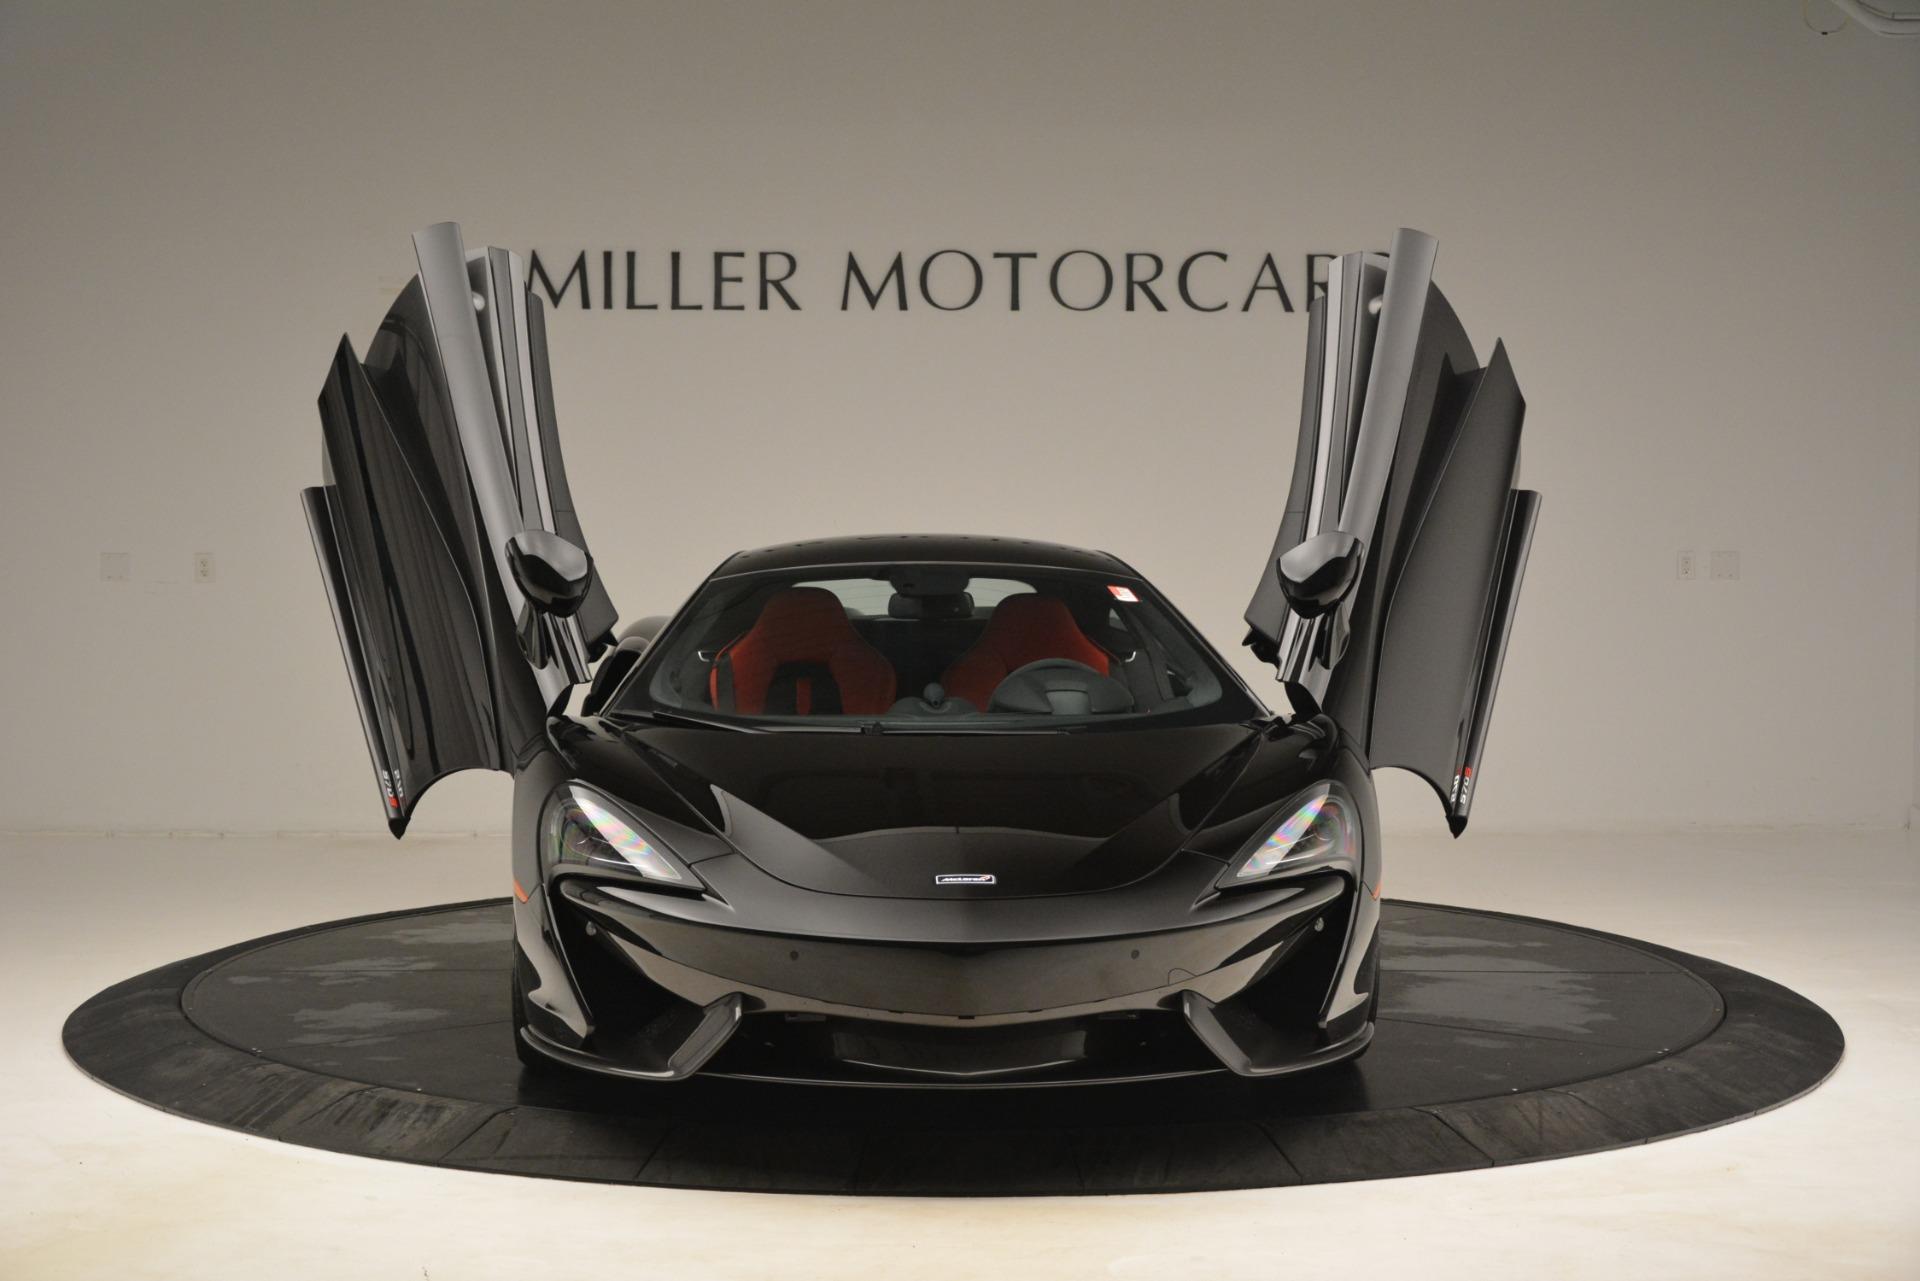 Used 2016 McLaren 570S Coupe For Sale In Westport, CT 3268_p12